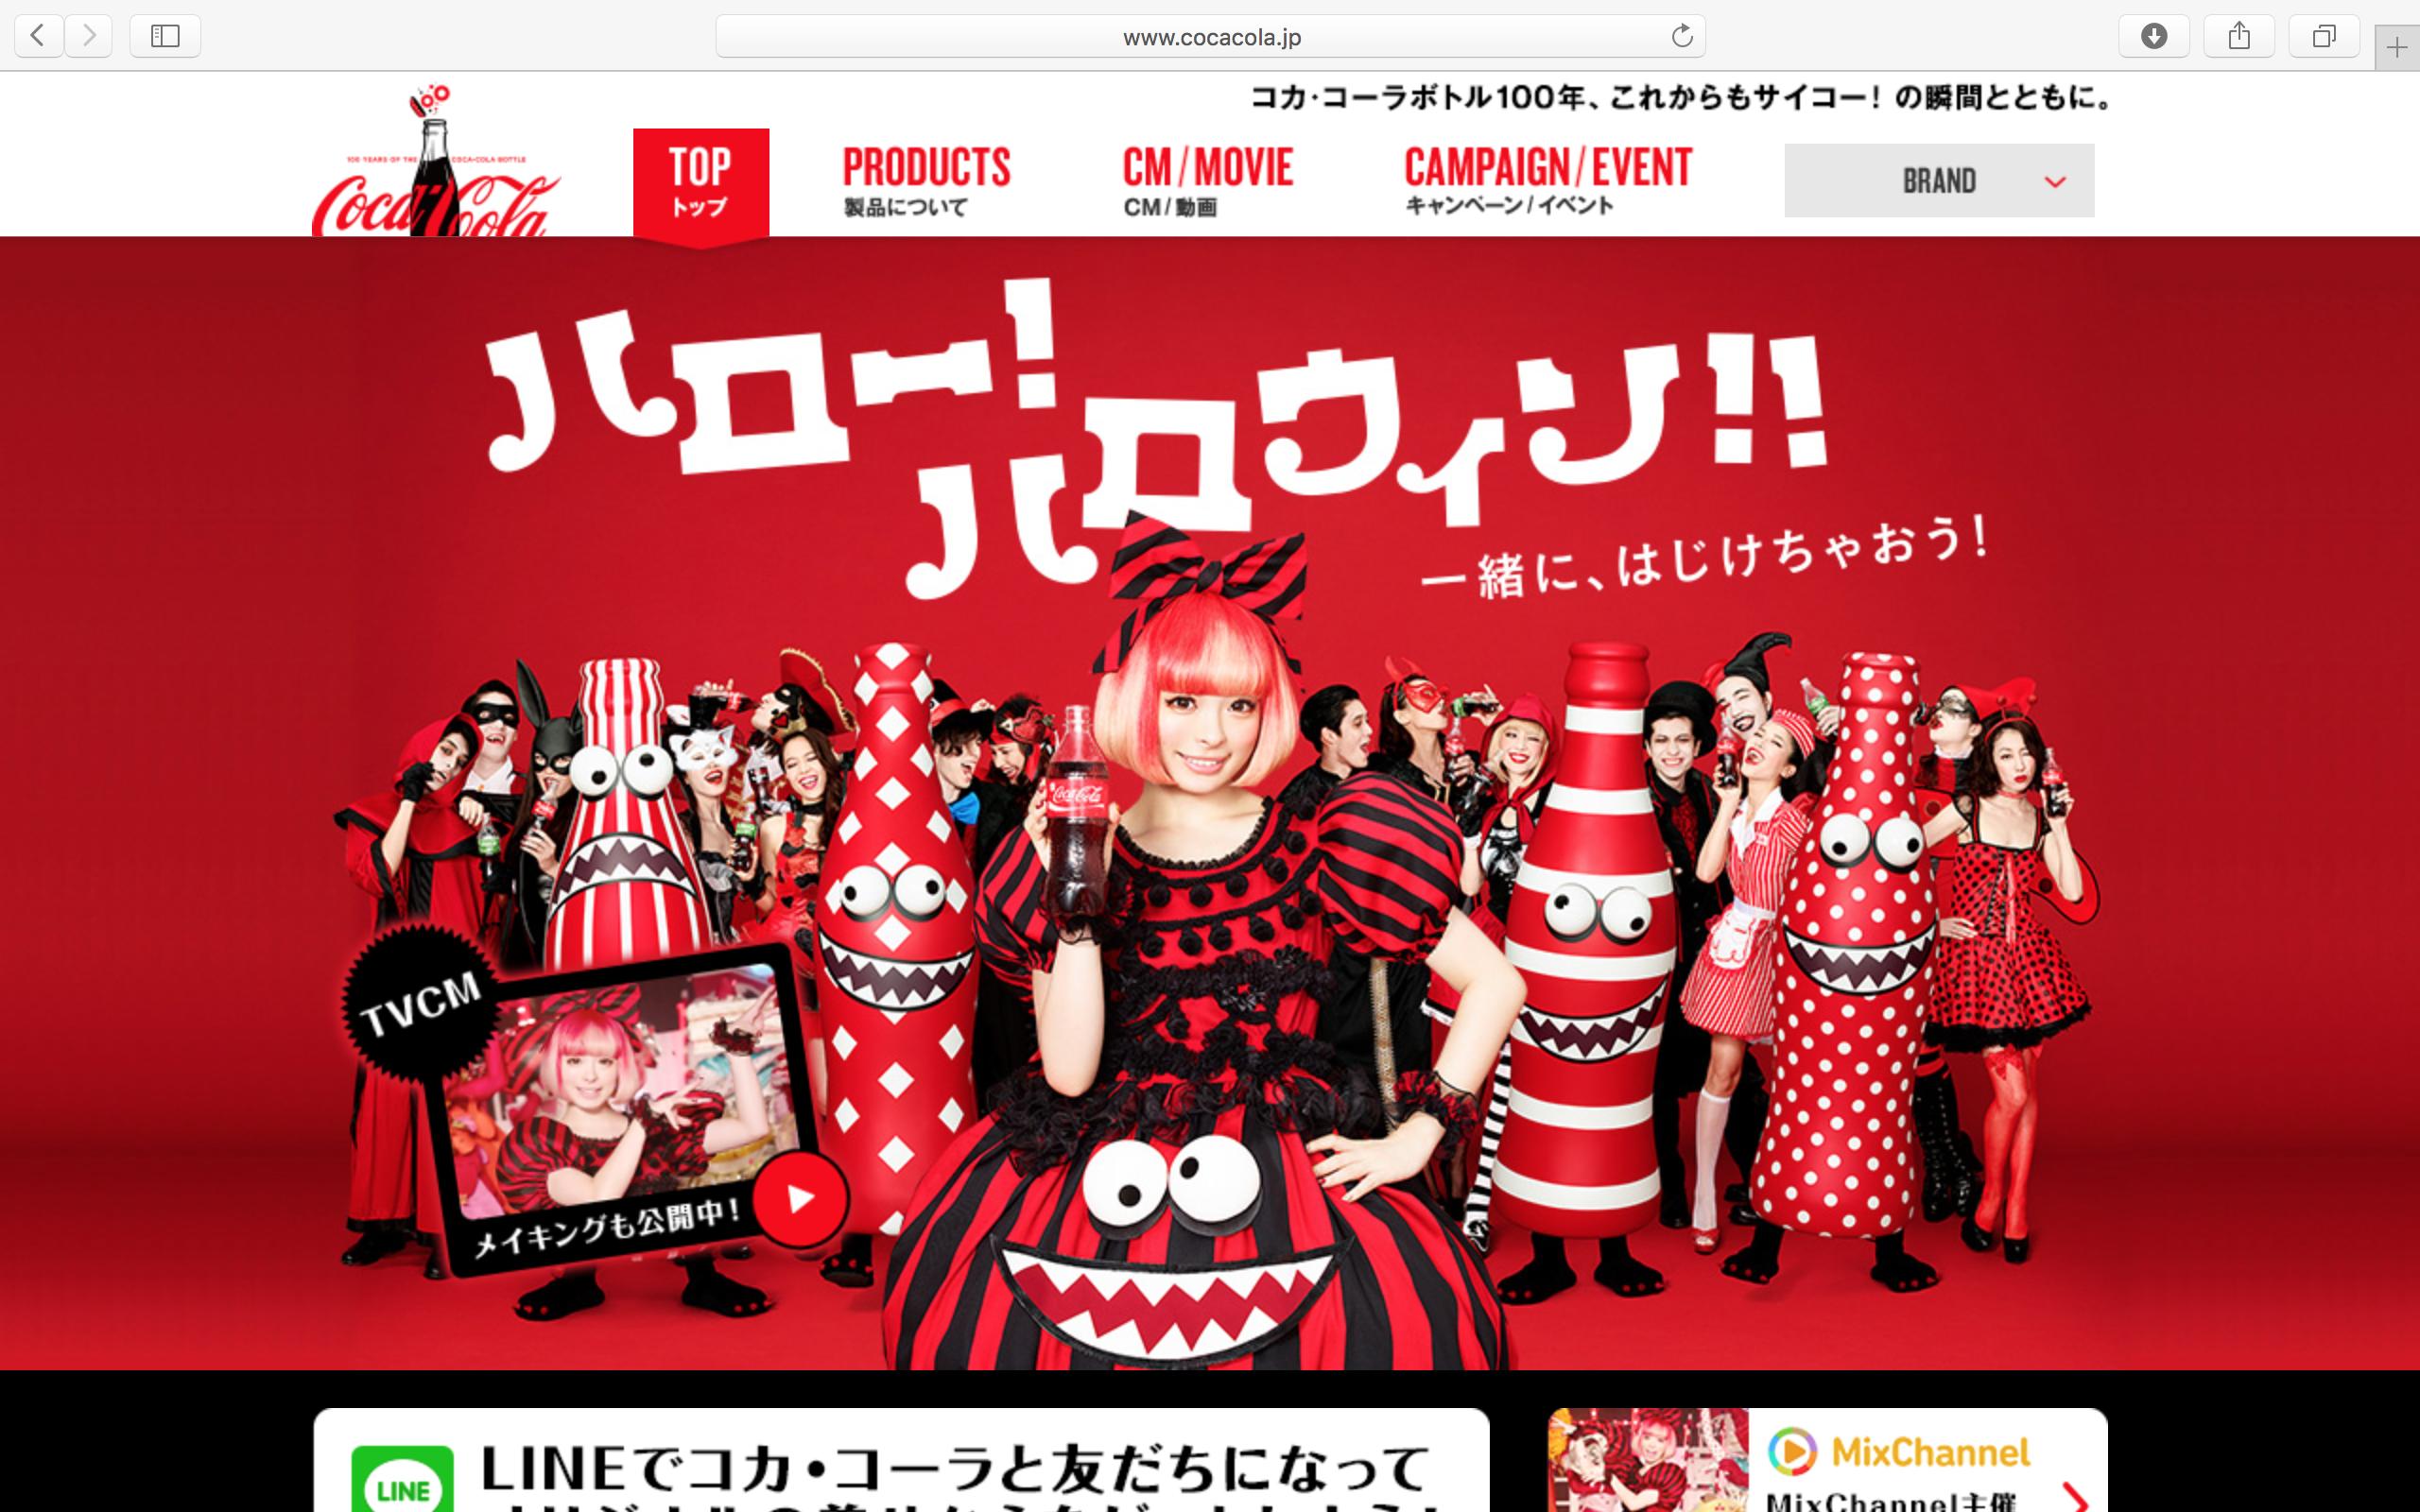 2015 Interbrand - Coca-Cola